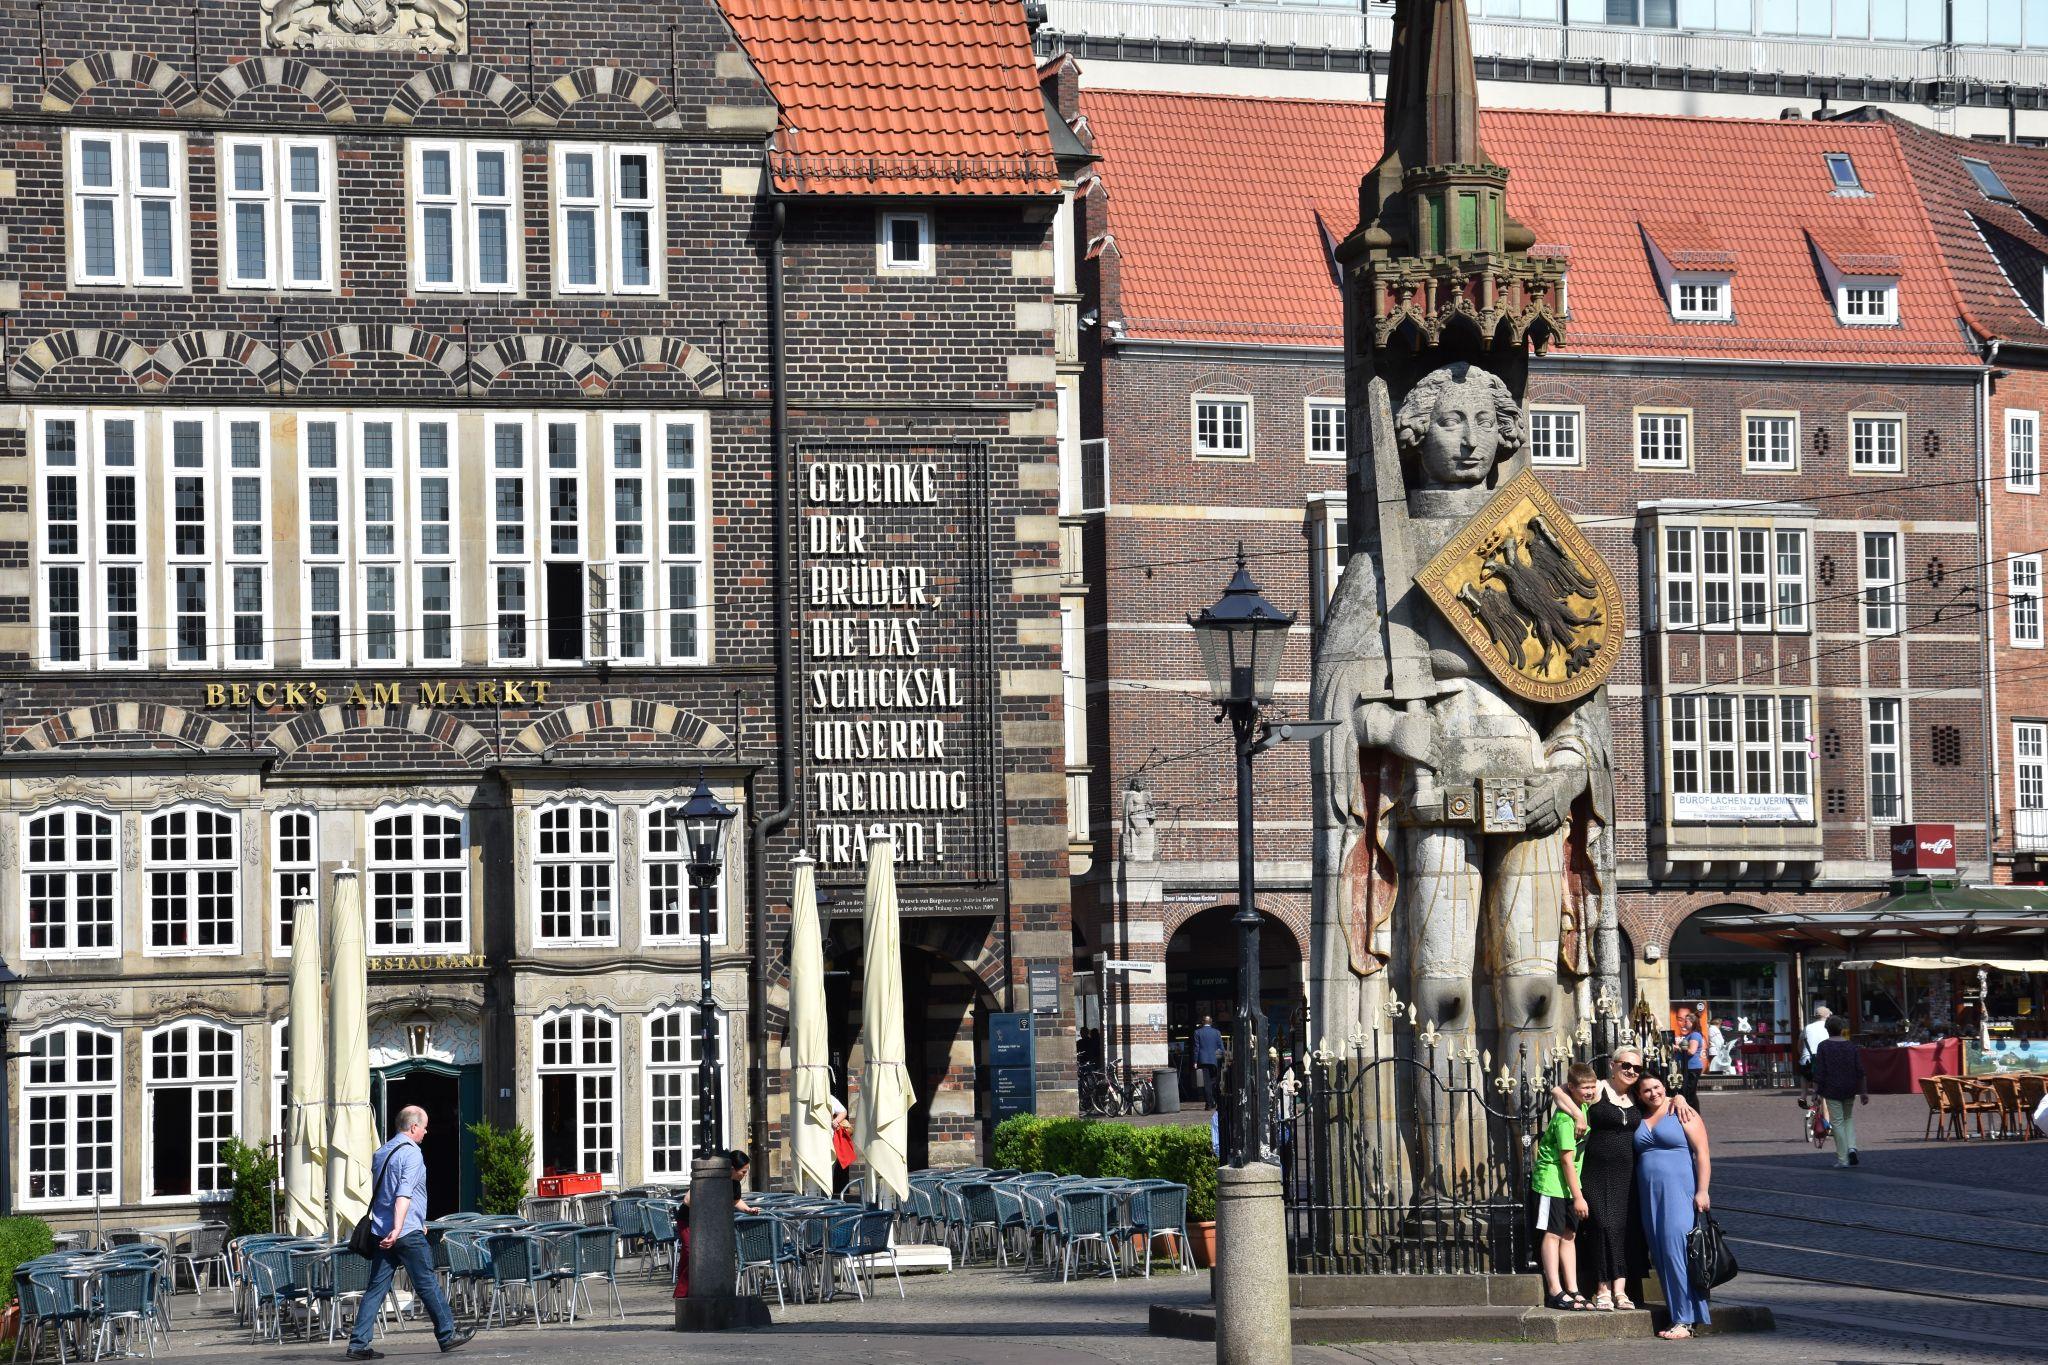 Bremen Roland, Germany